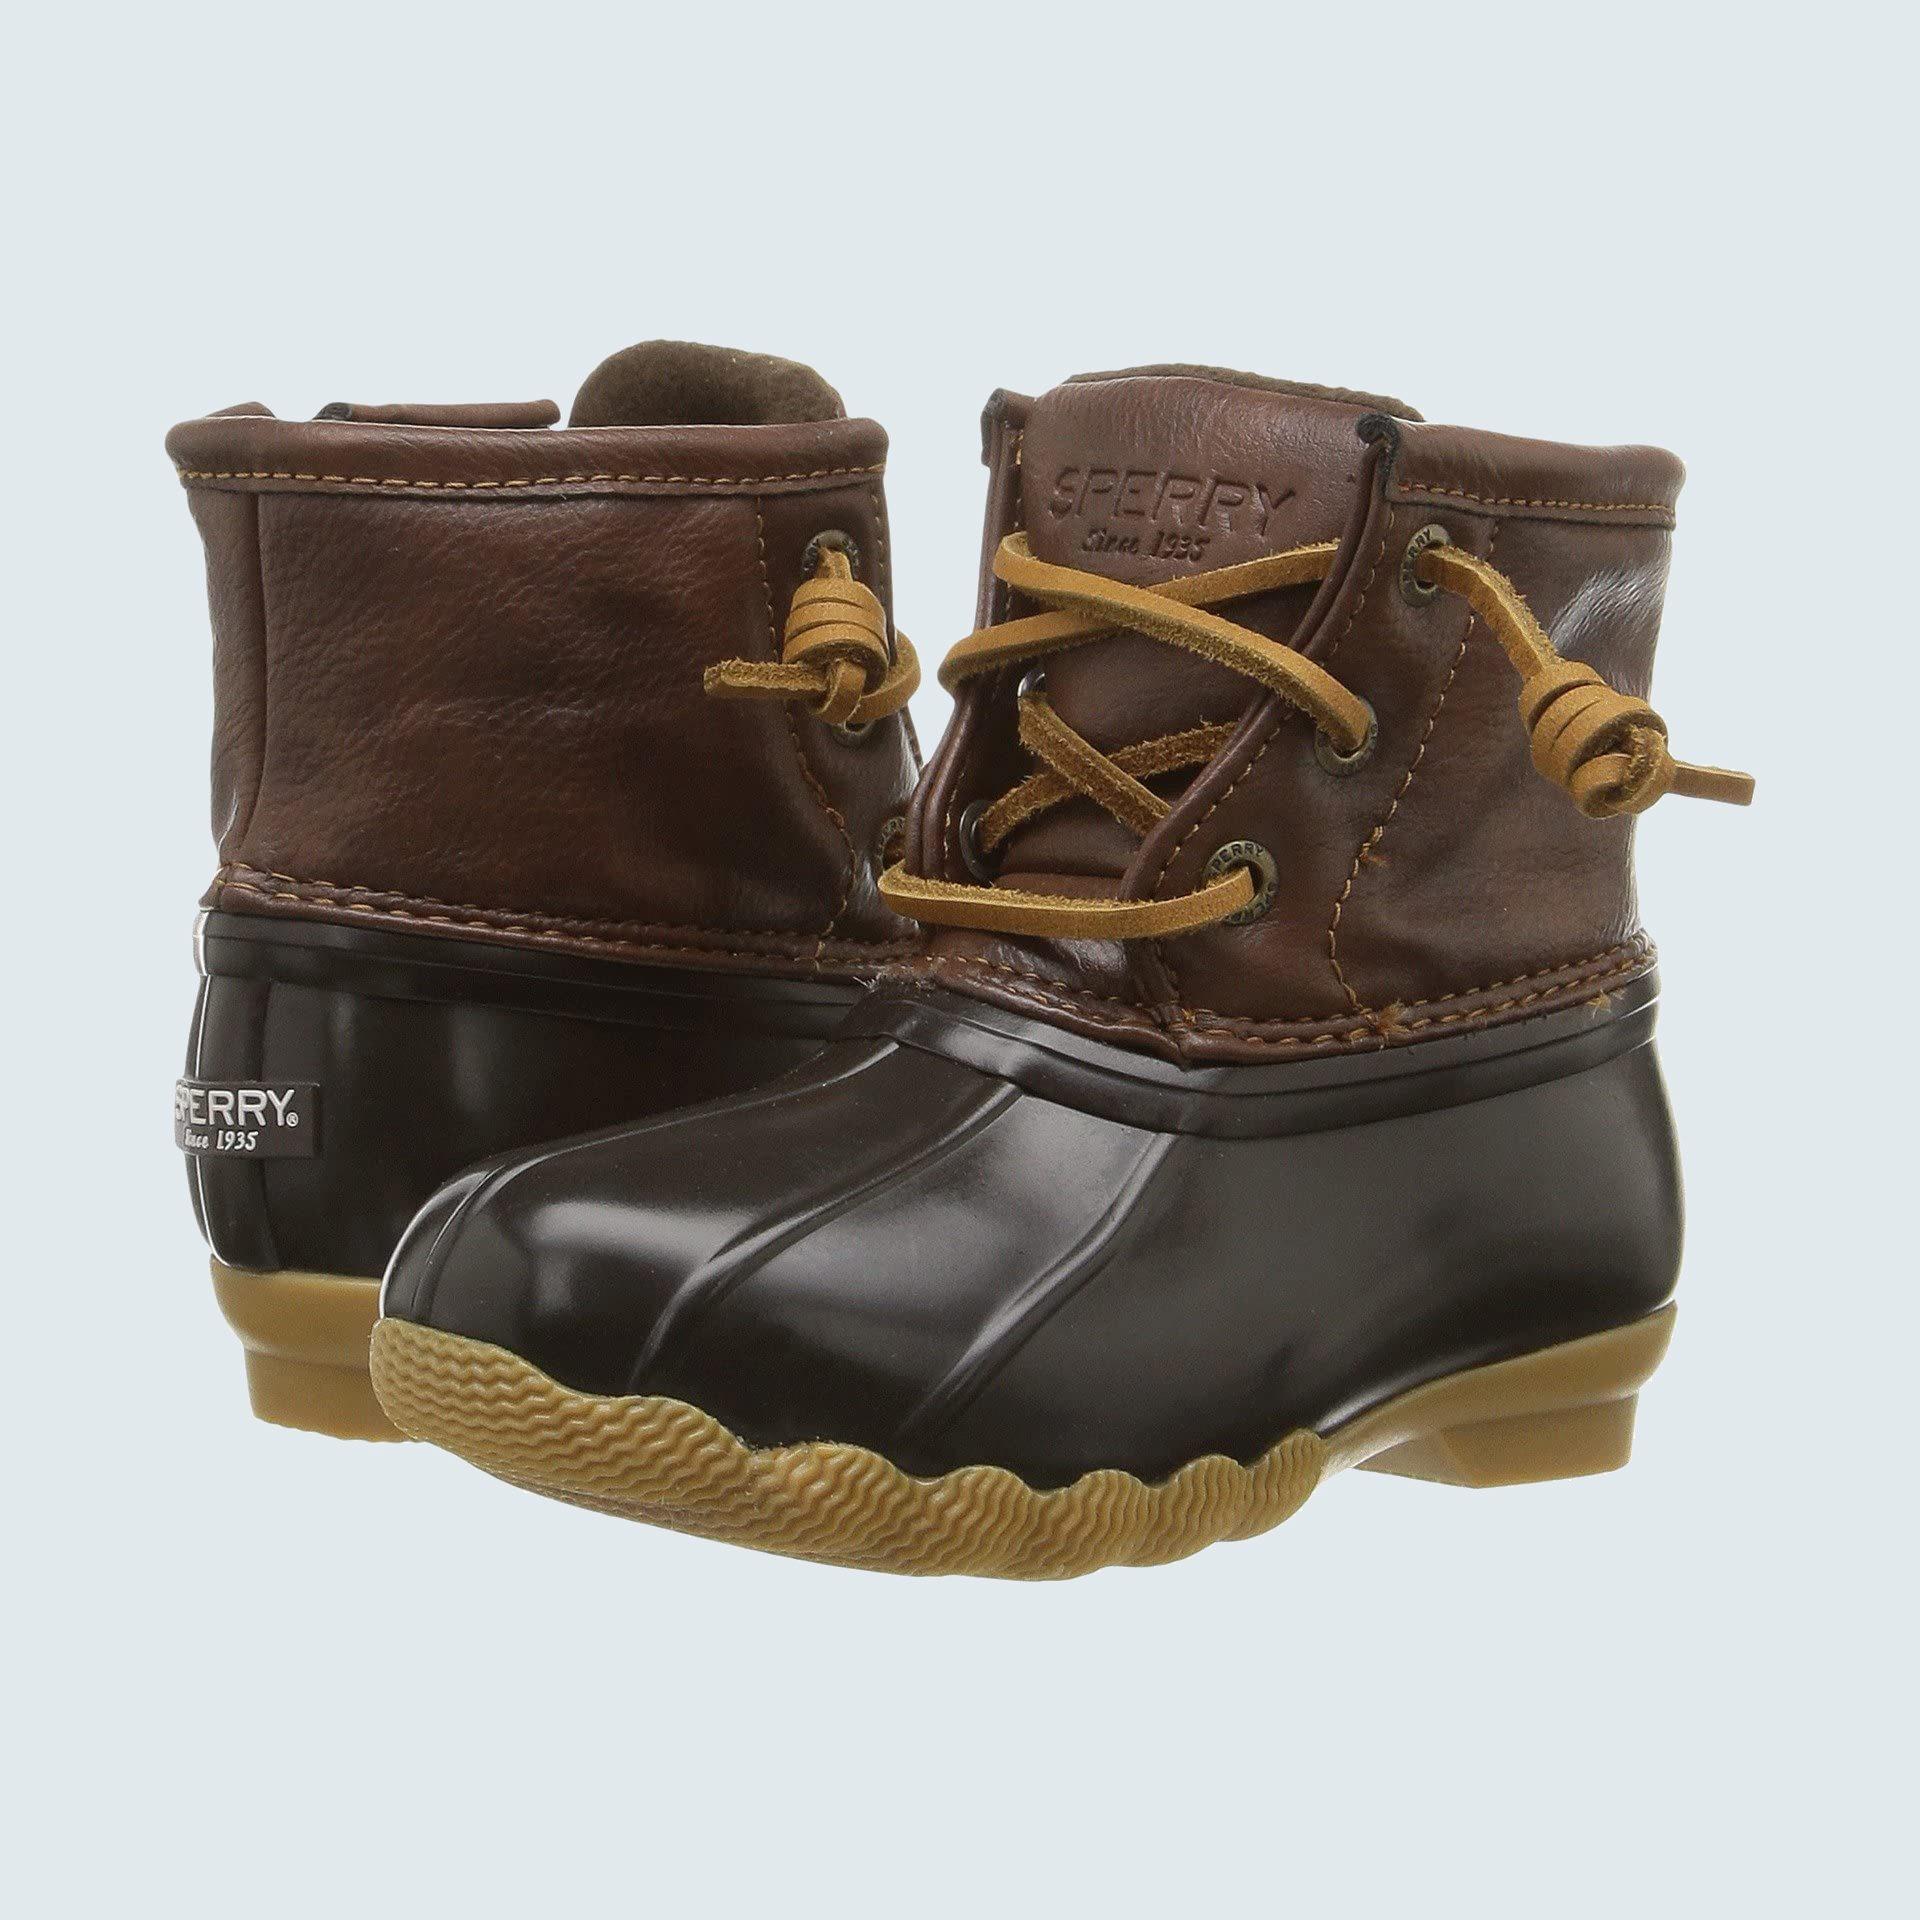 Sperry Kids Saltwater Boots